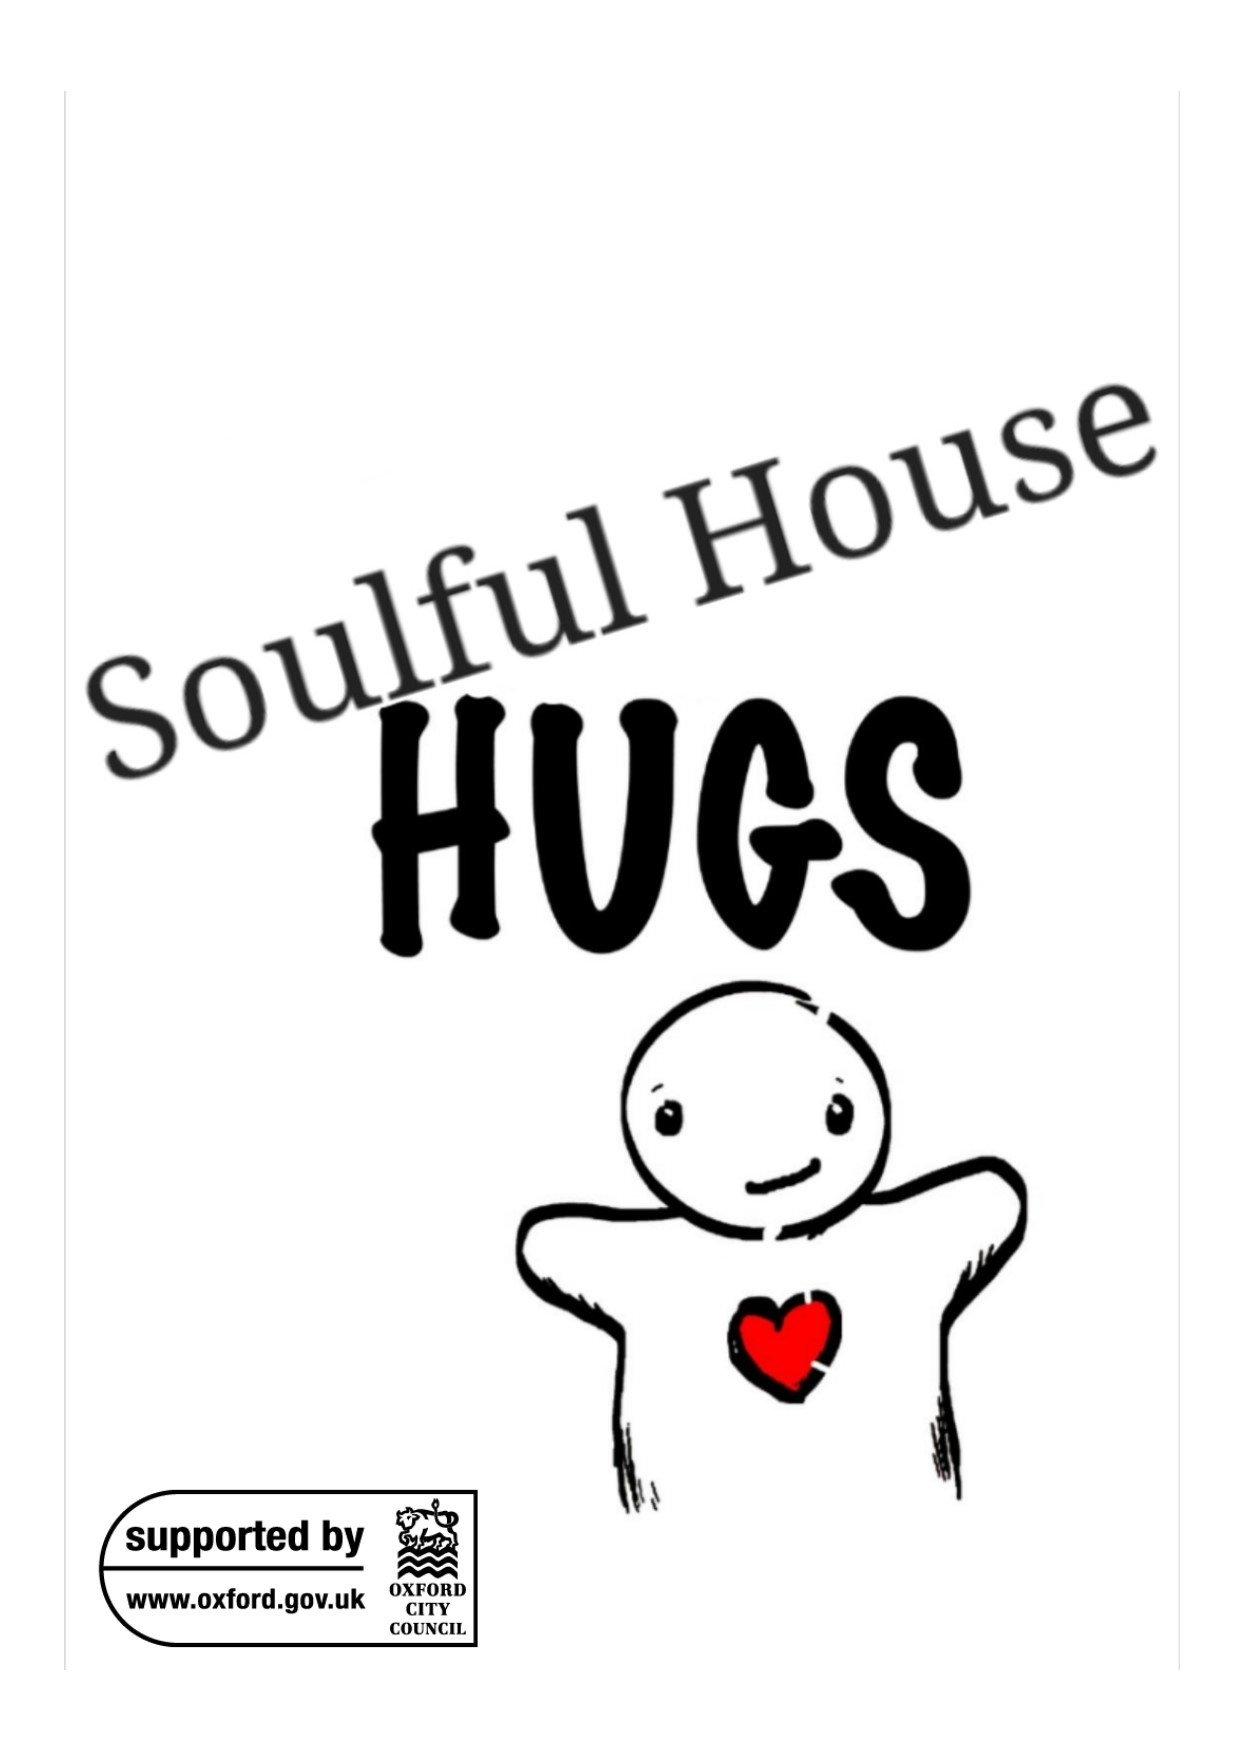 DJG AT SOULFUL HOUSE HUGS